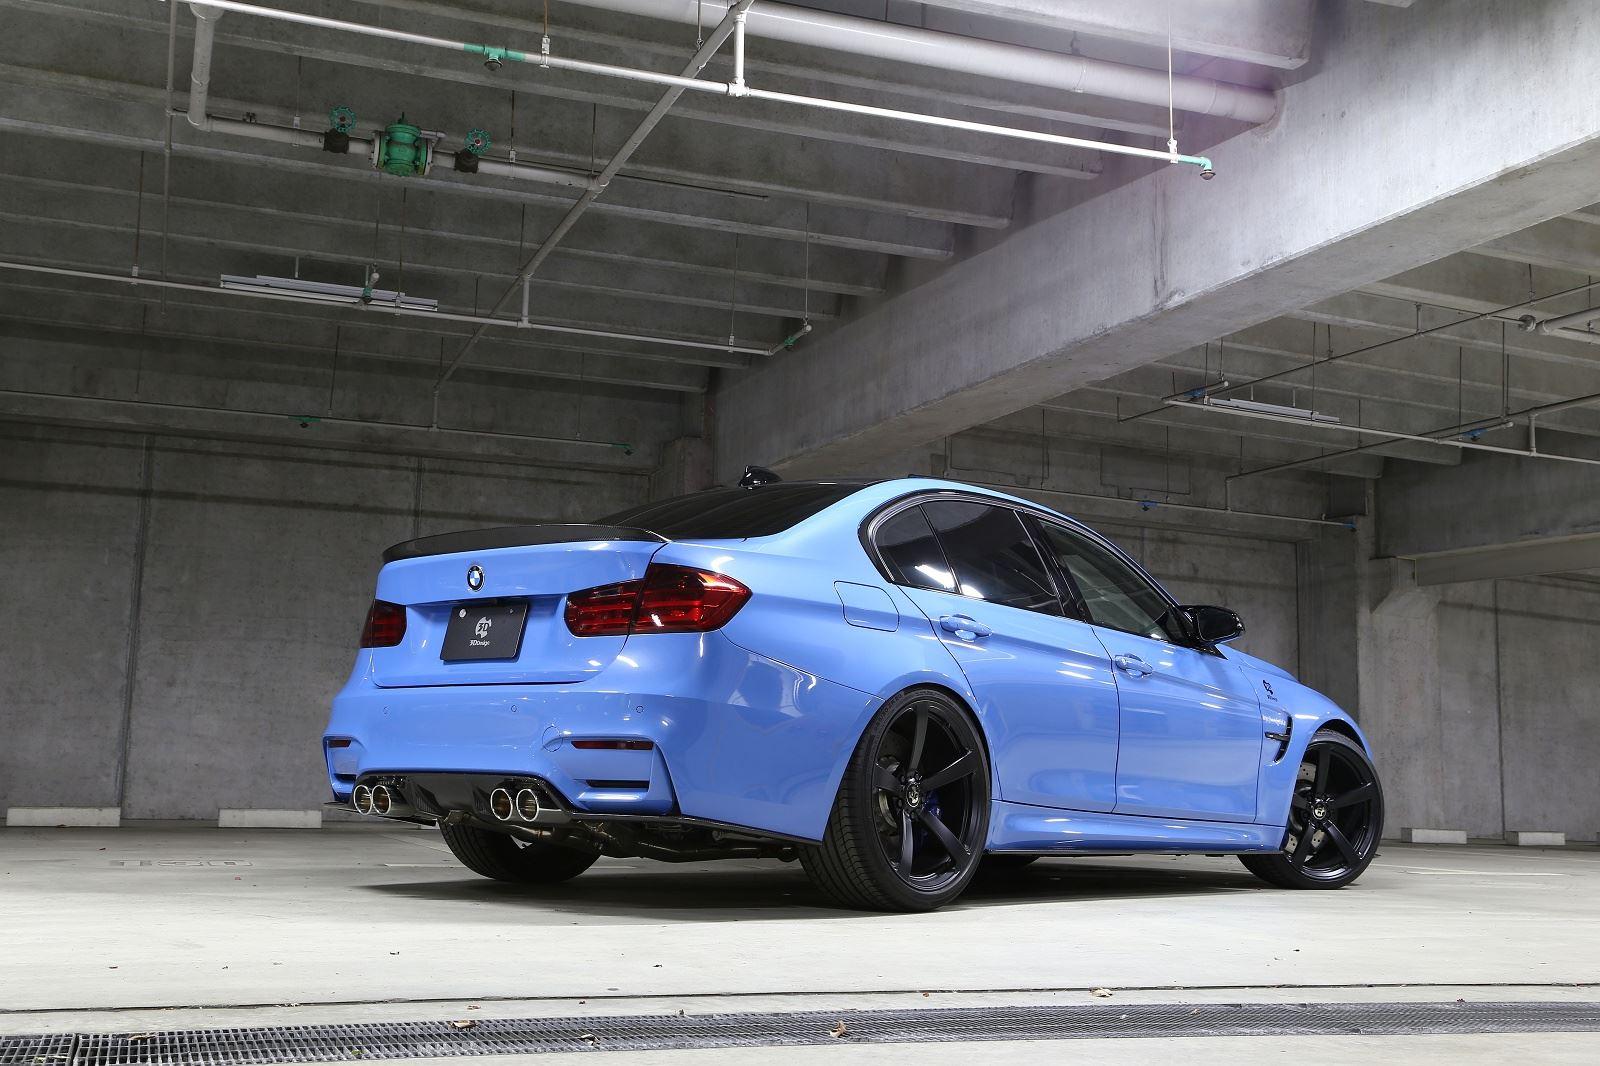 3d Design Tweaks Blue Bmw F80 M3 Gtspirit